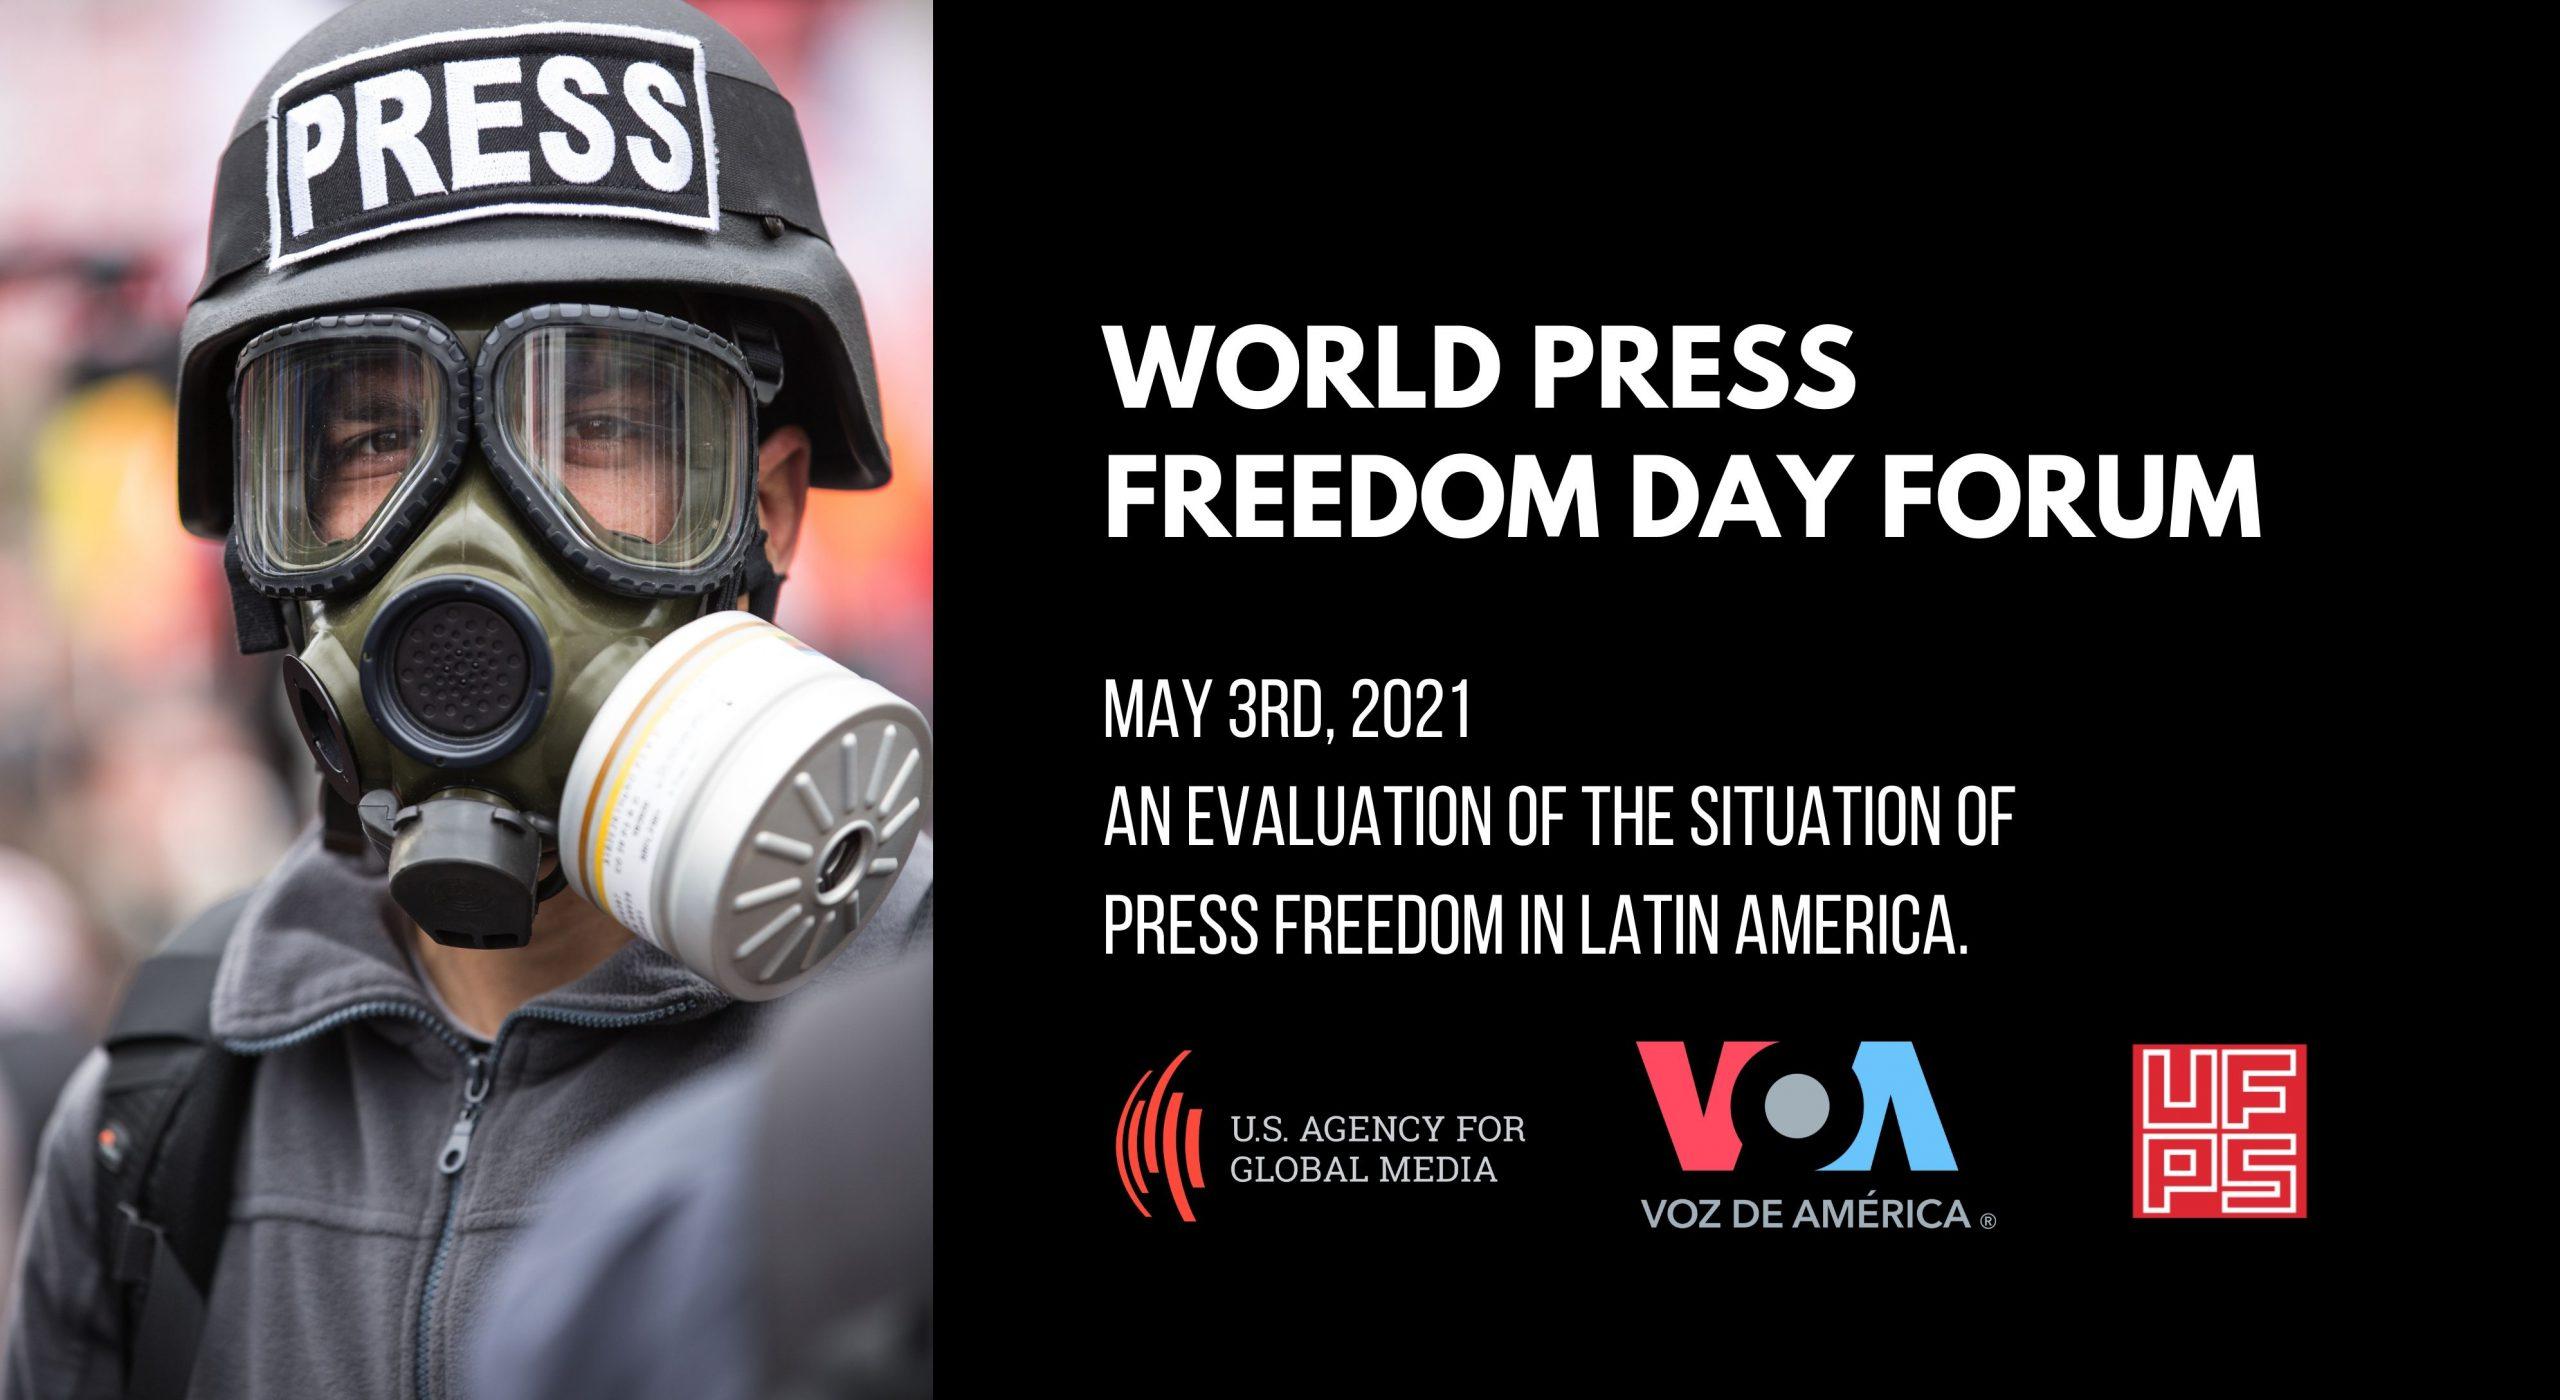 Latin America: World Press Freedom Day Forum